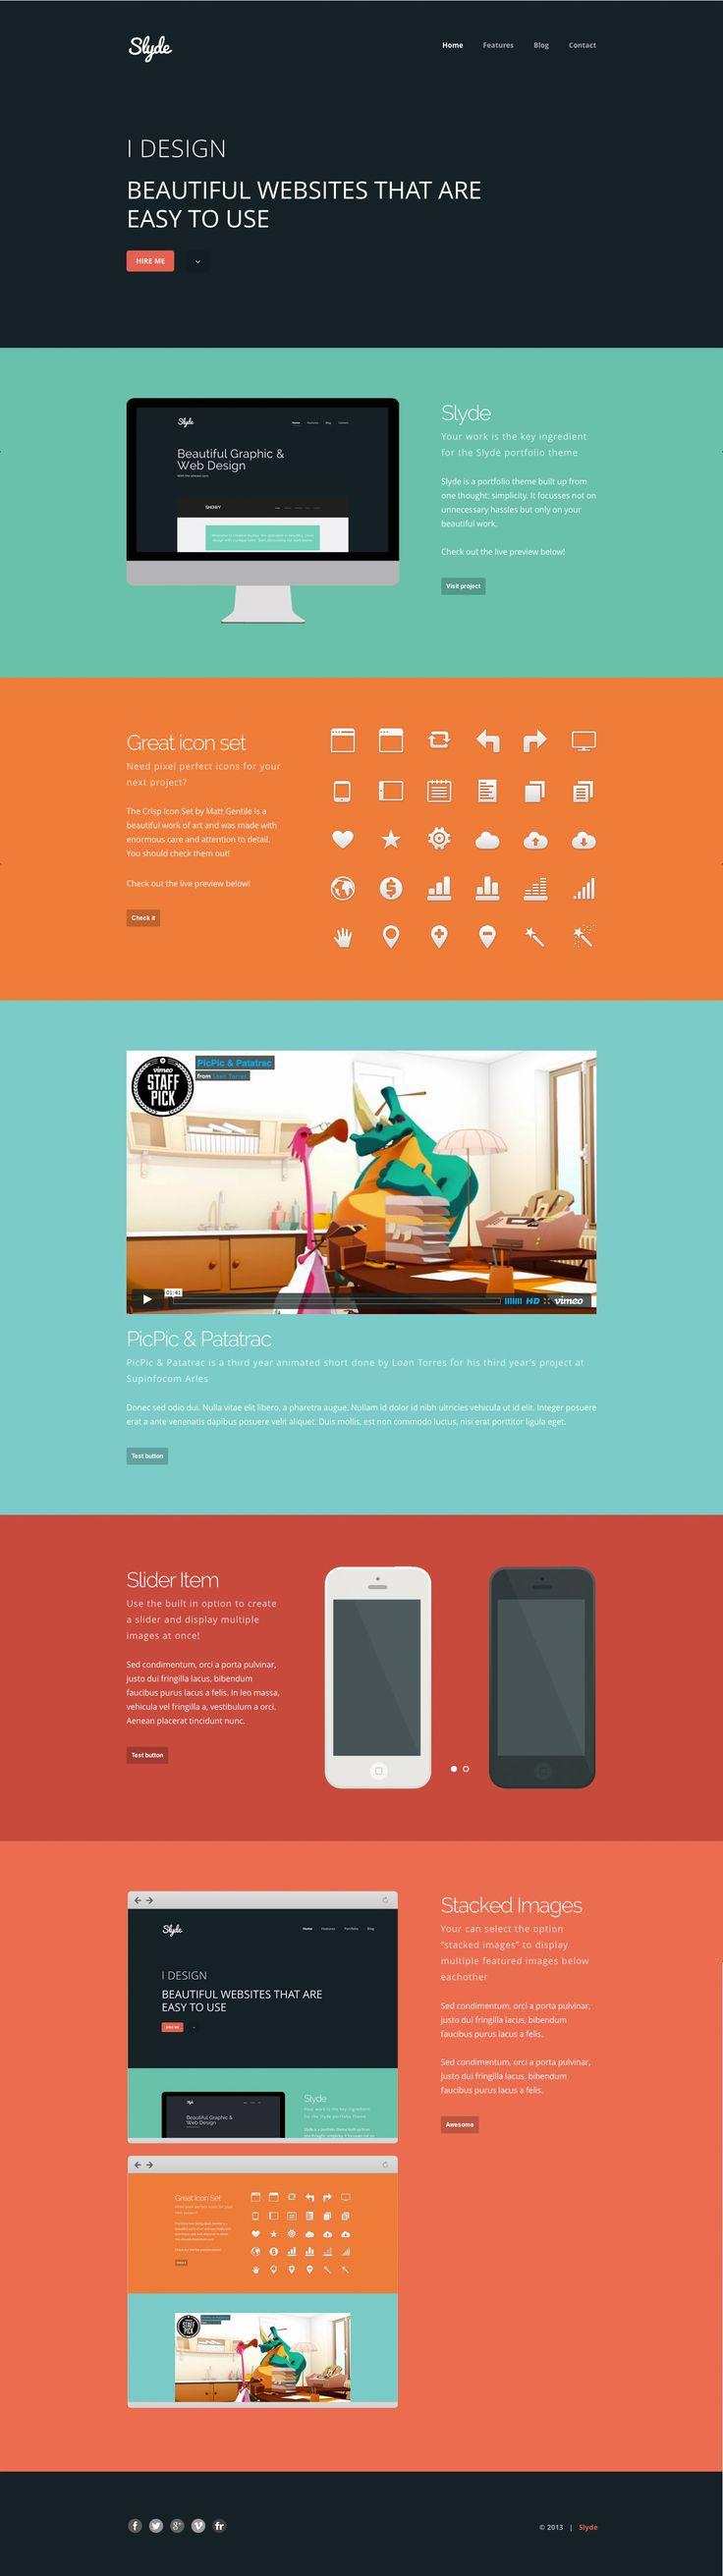 Flat website design / layout